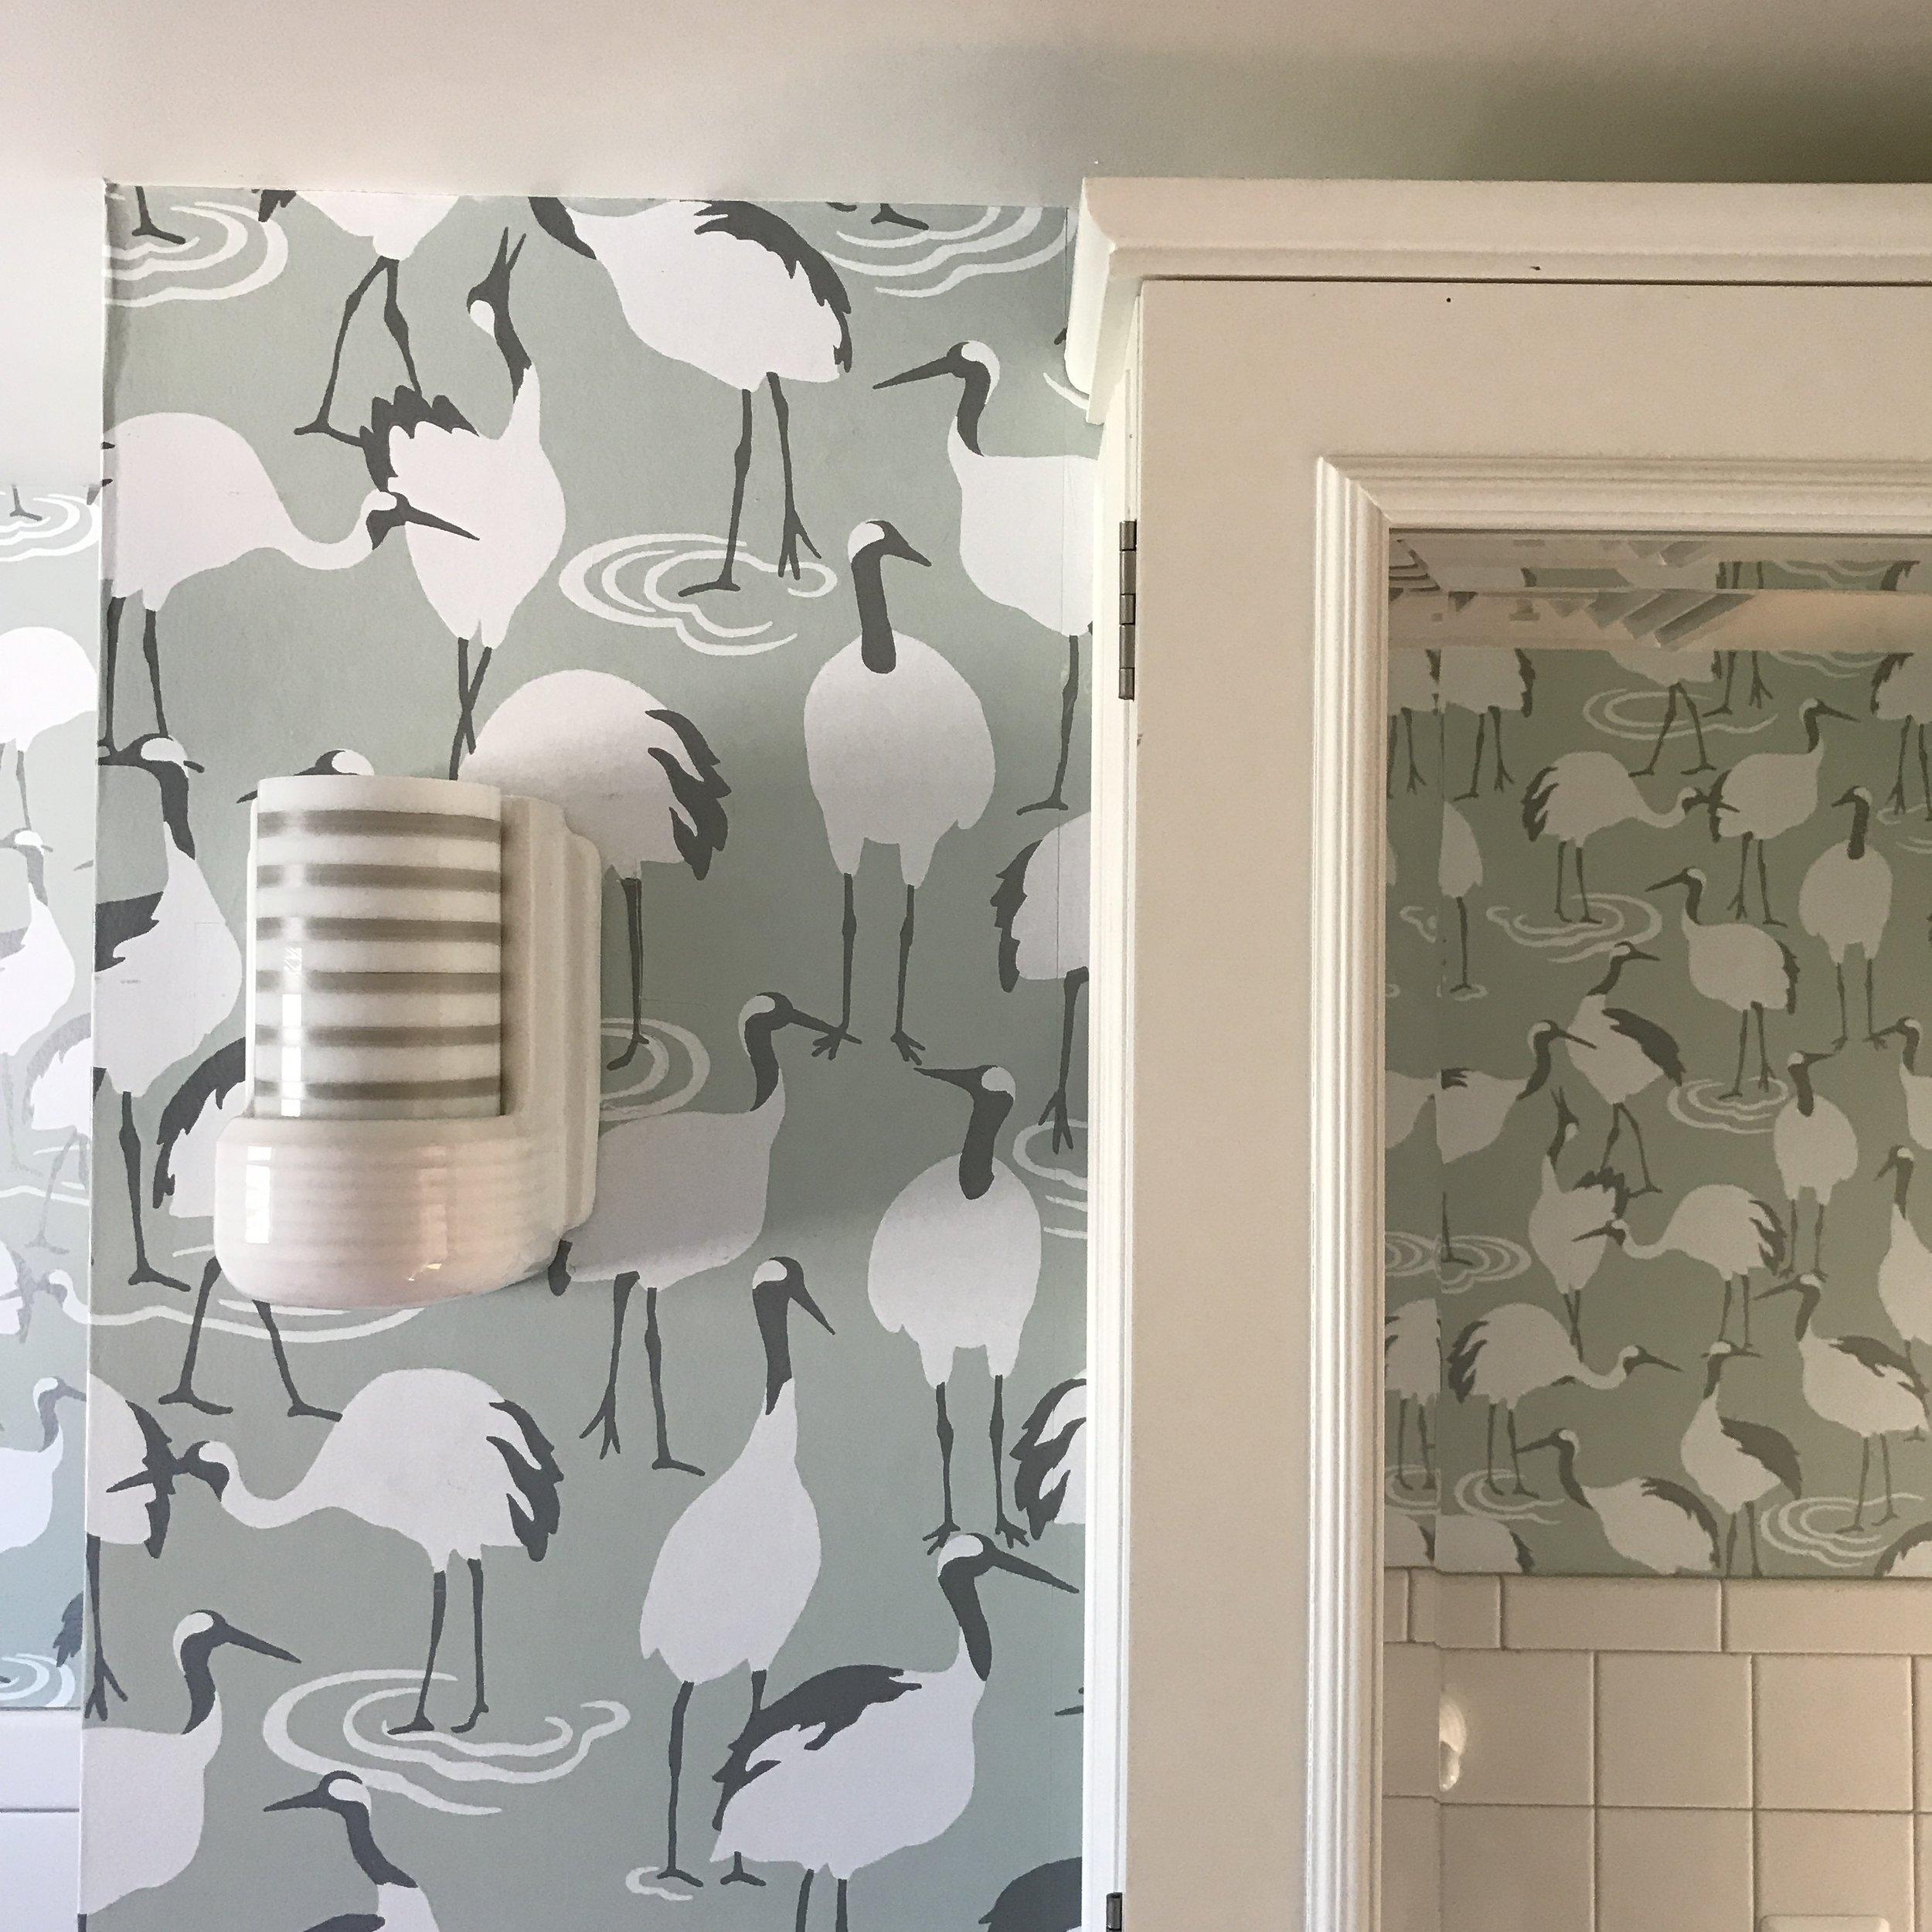 Chouxdesigns_Nurserybathroom_storkwallpaper.JPG